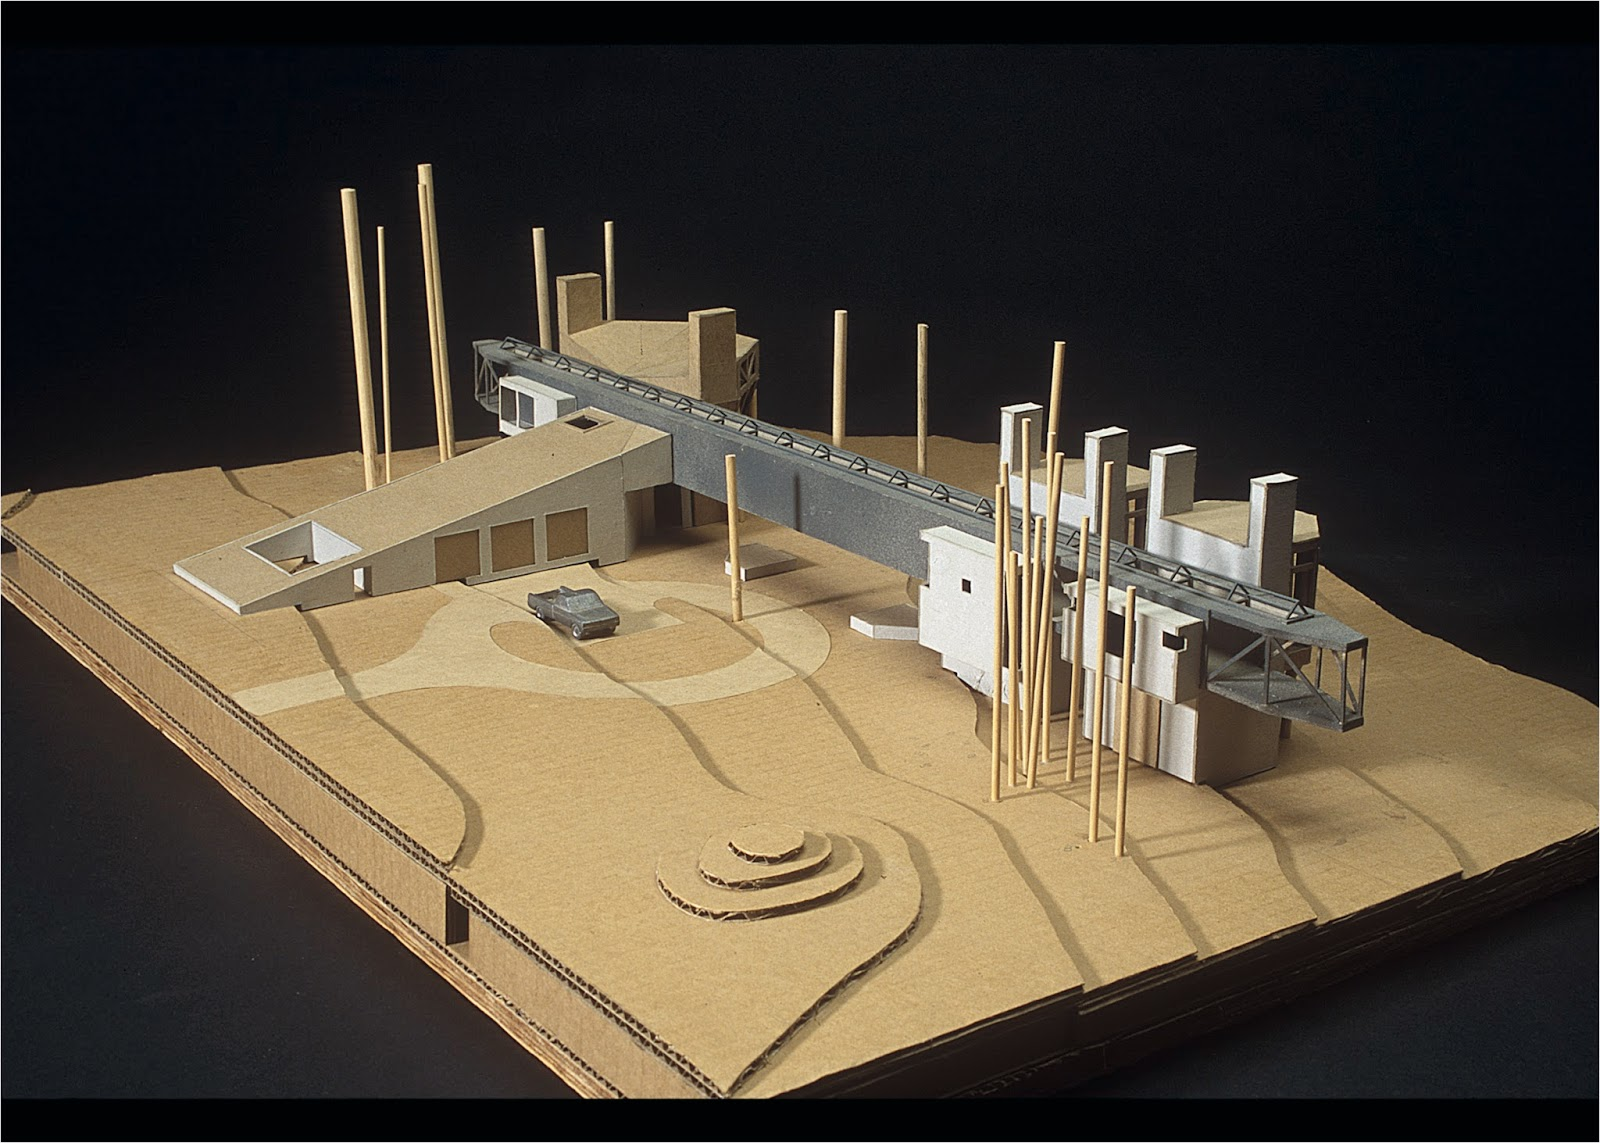 OBIE BOWMAN ARCHITECT FAIA MY JOURNAL: The Long Plan